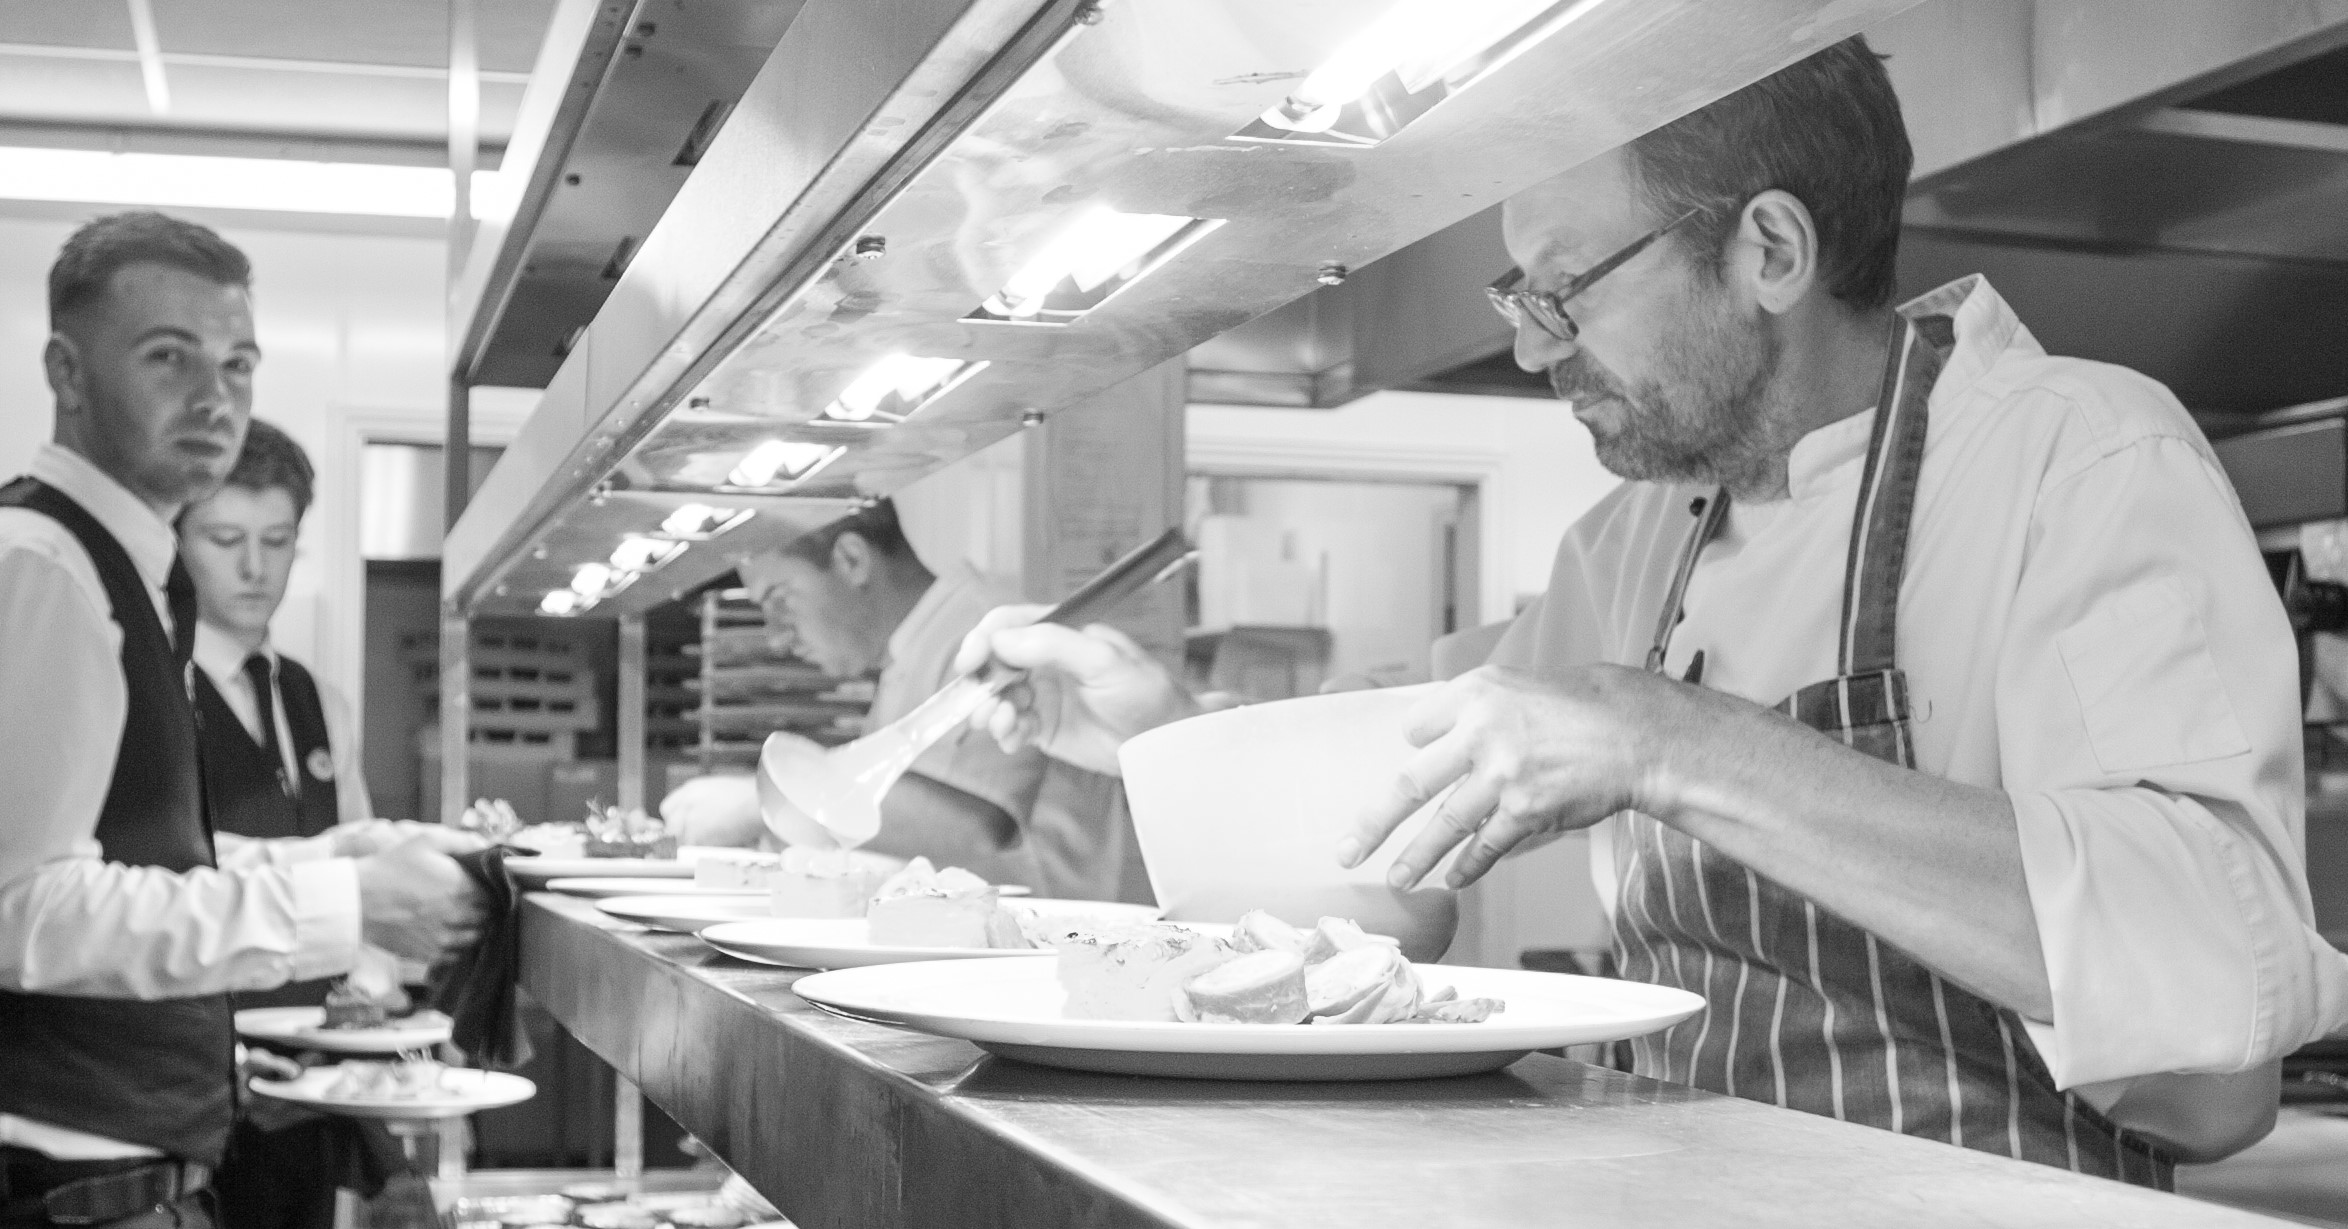 Head Chef preparing Dinner